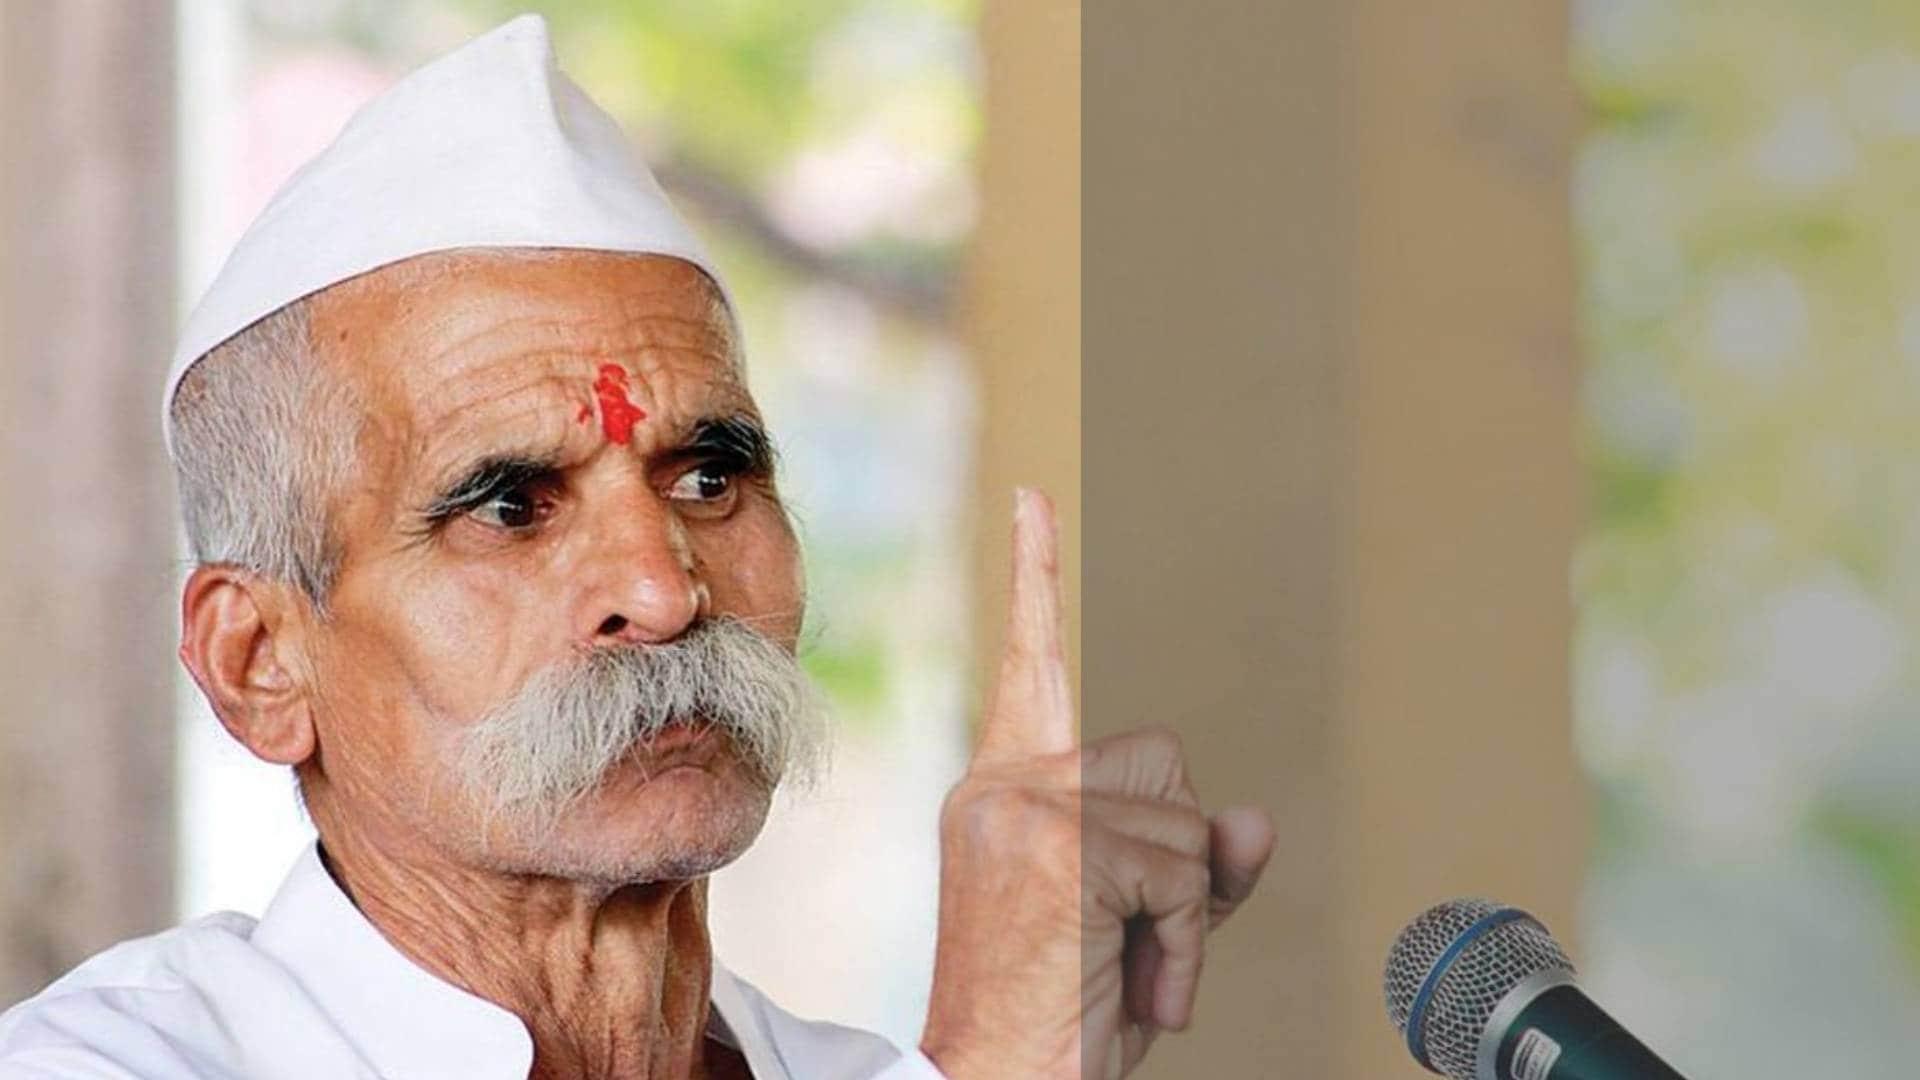 On the trail of Sambhaji Bhide: Ahead of Bhima Koregaon riots' 3rd anniversary, tracing the Hindutva leader's rise